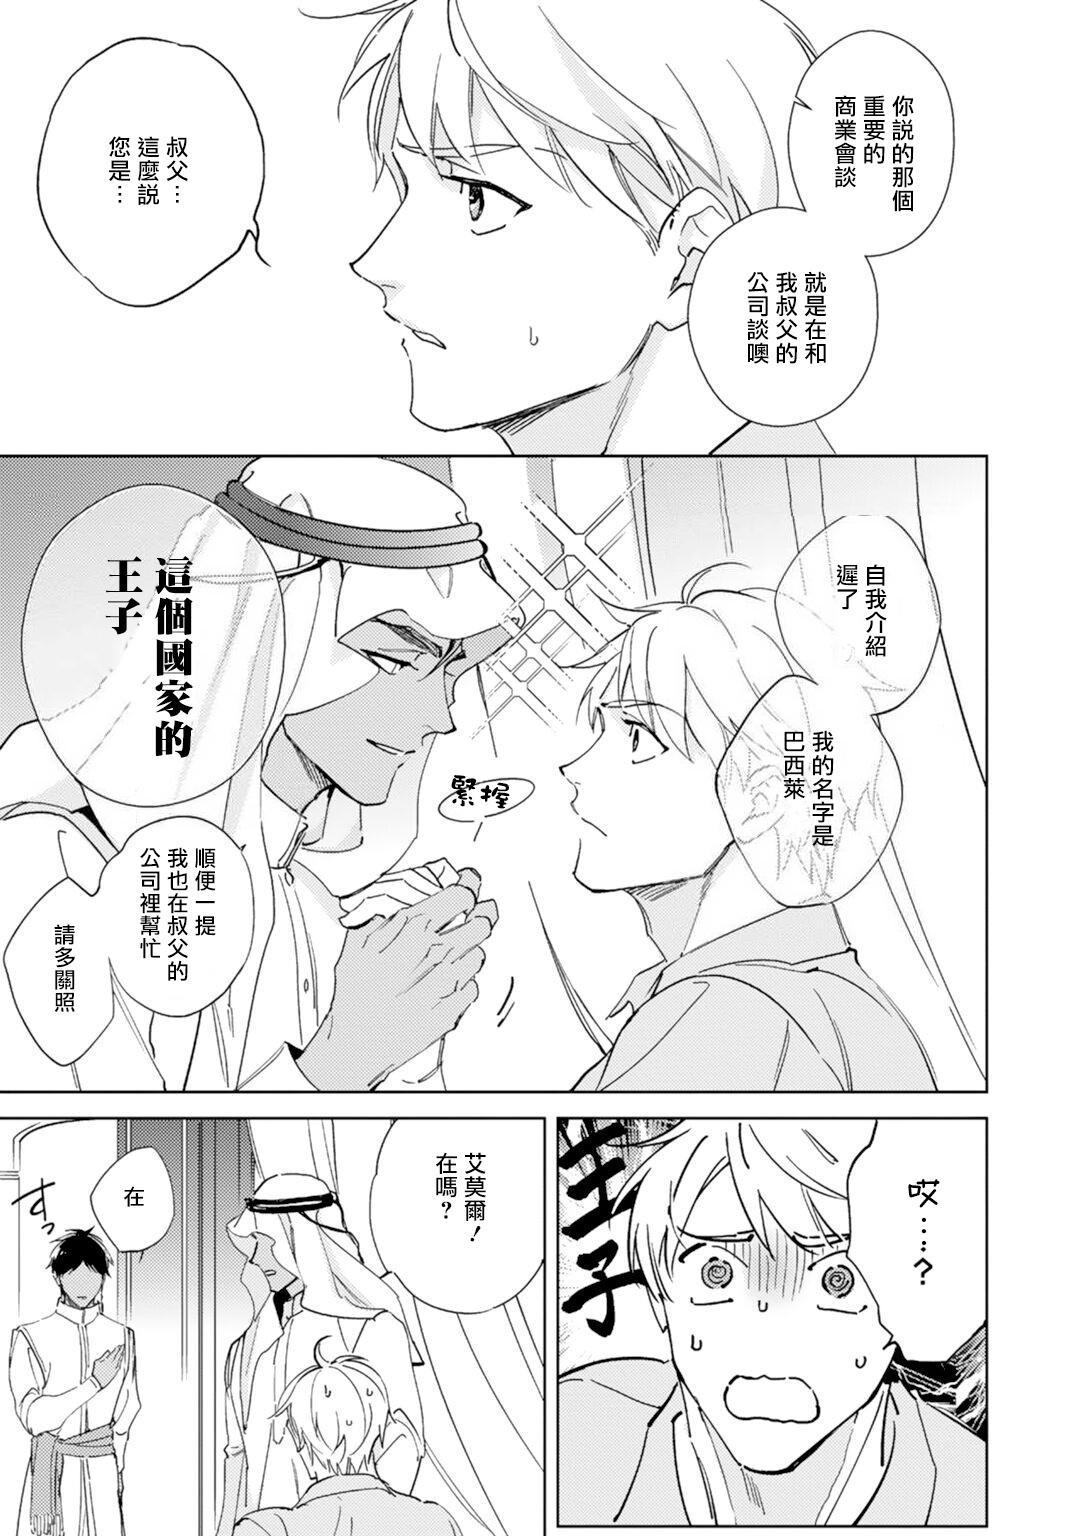 Amber Vanilla no Hanayome | 琥珀香草的新娘 Ch. 1-3 9